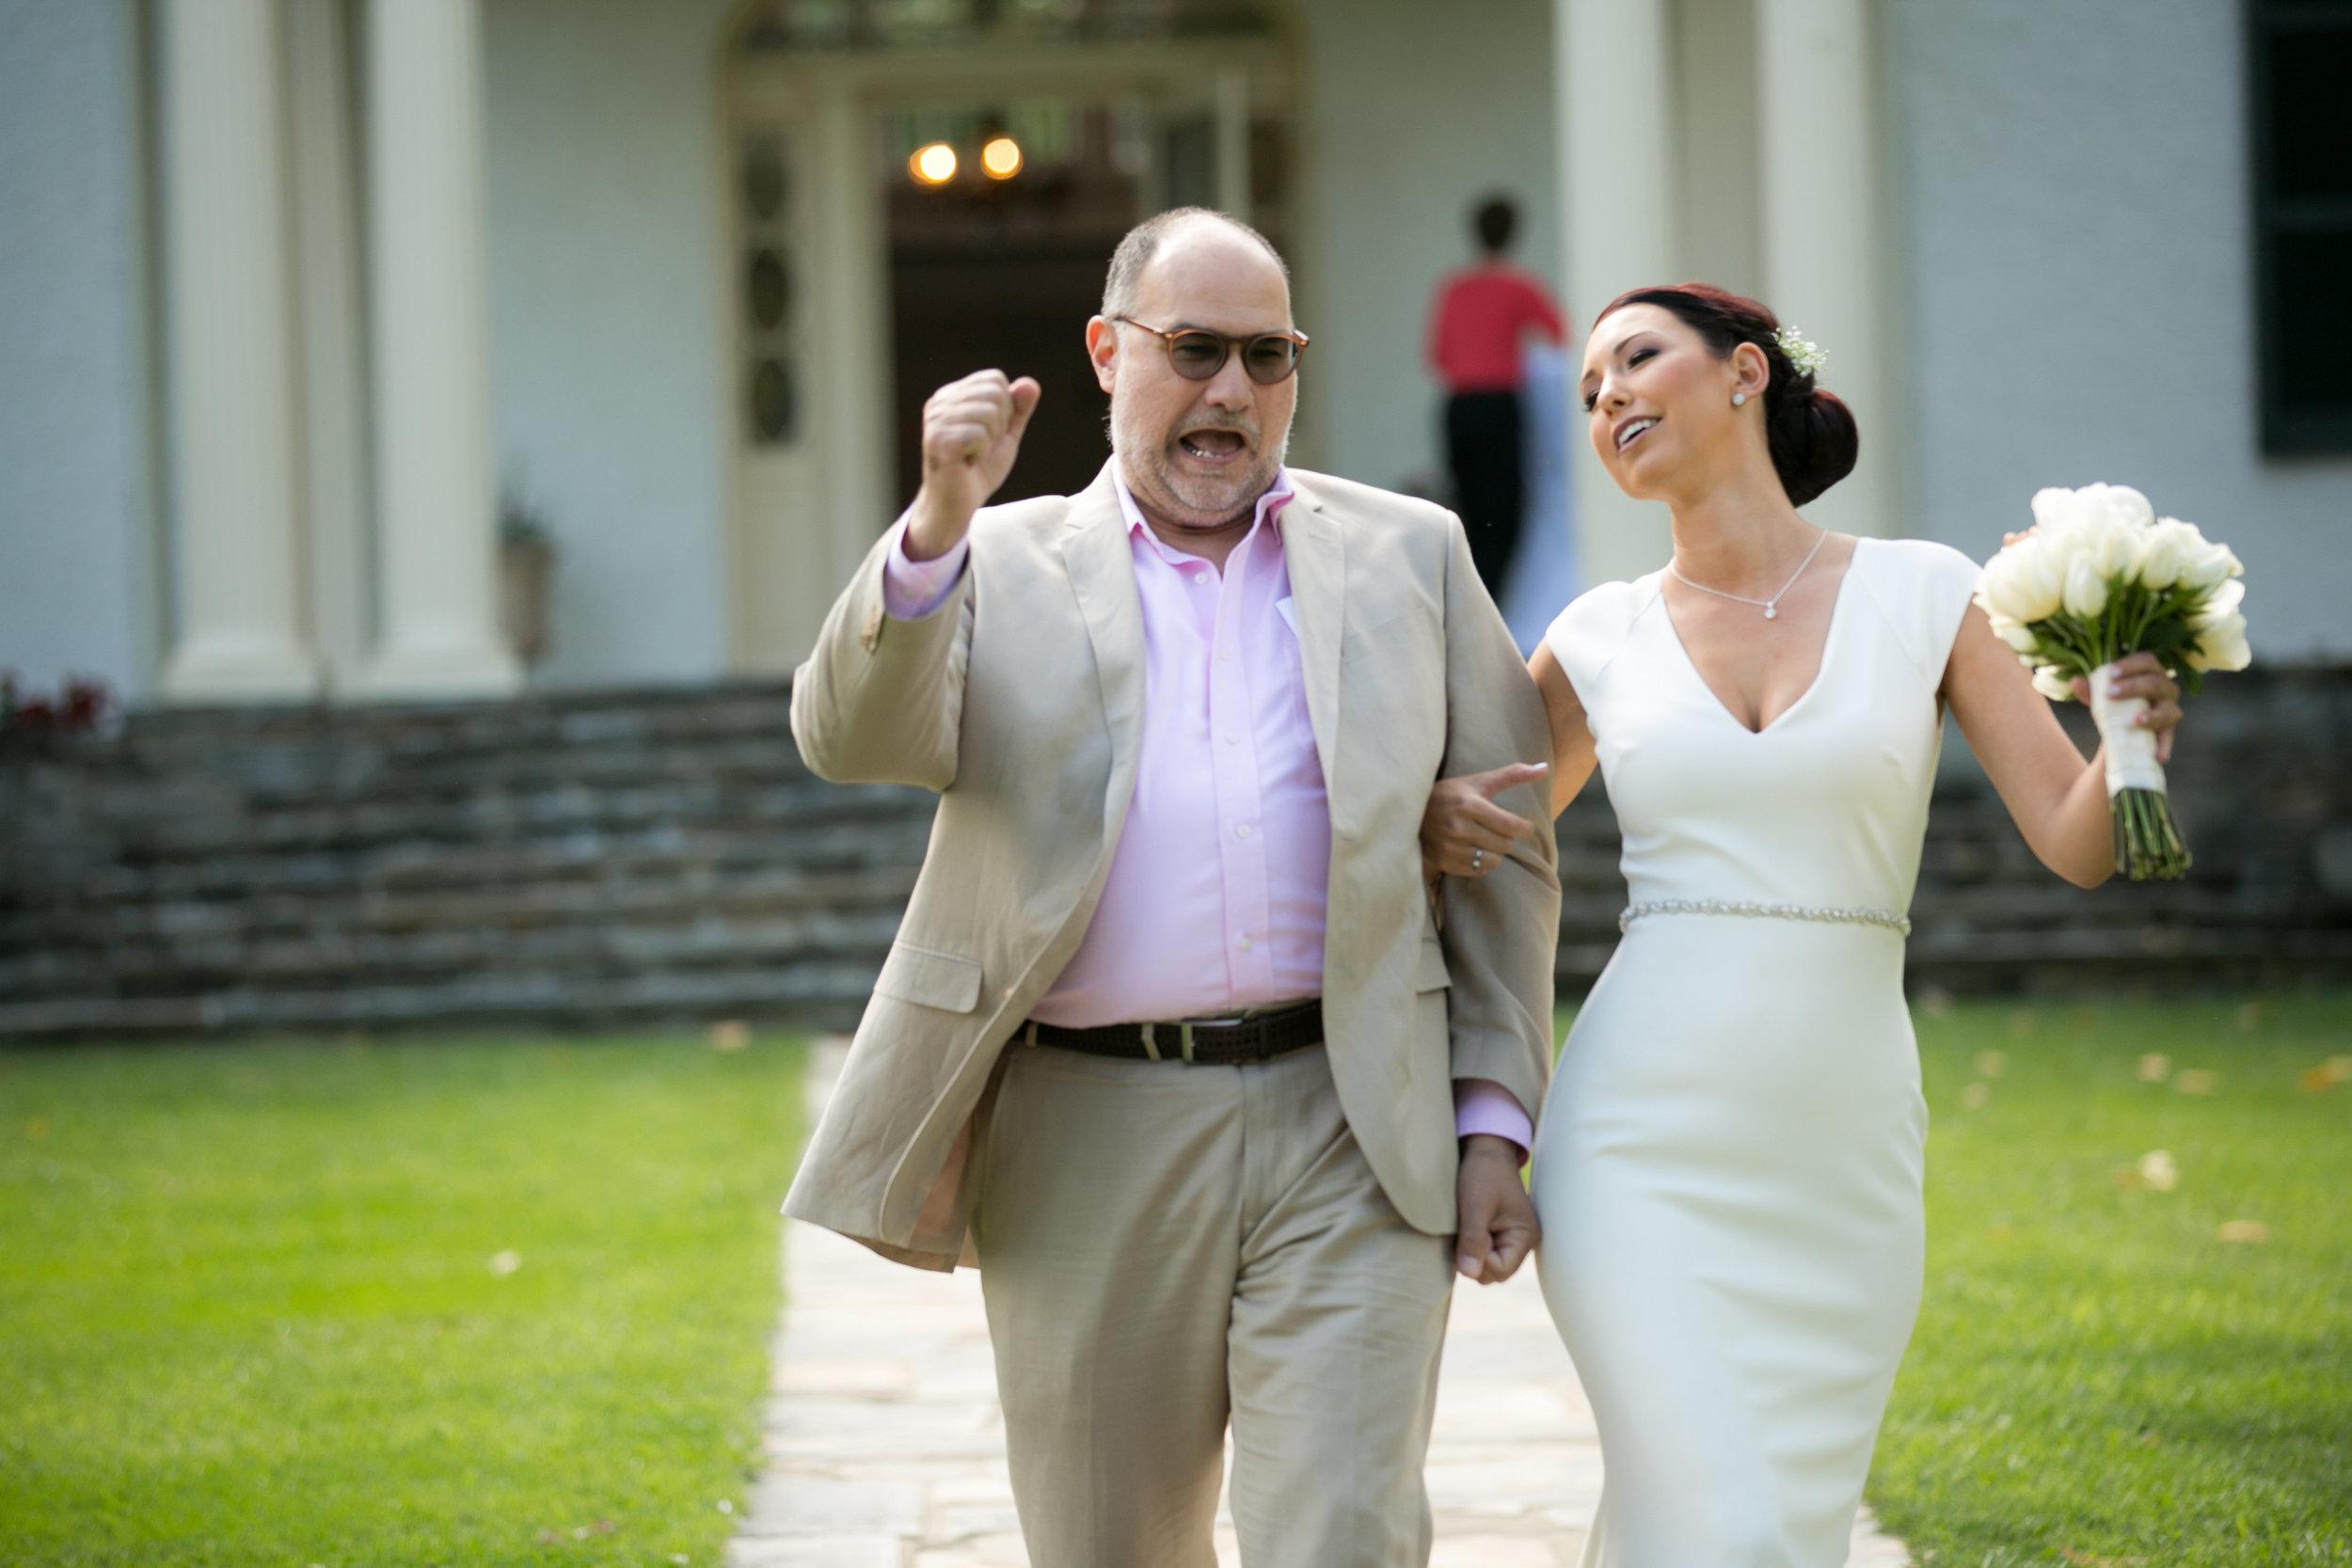 Pure elegance events Tynise Kee dc wedding planner va wedding planner rust manor house leesburg -0038.jpg